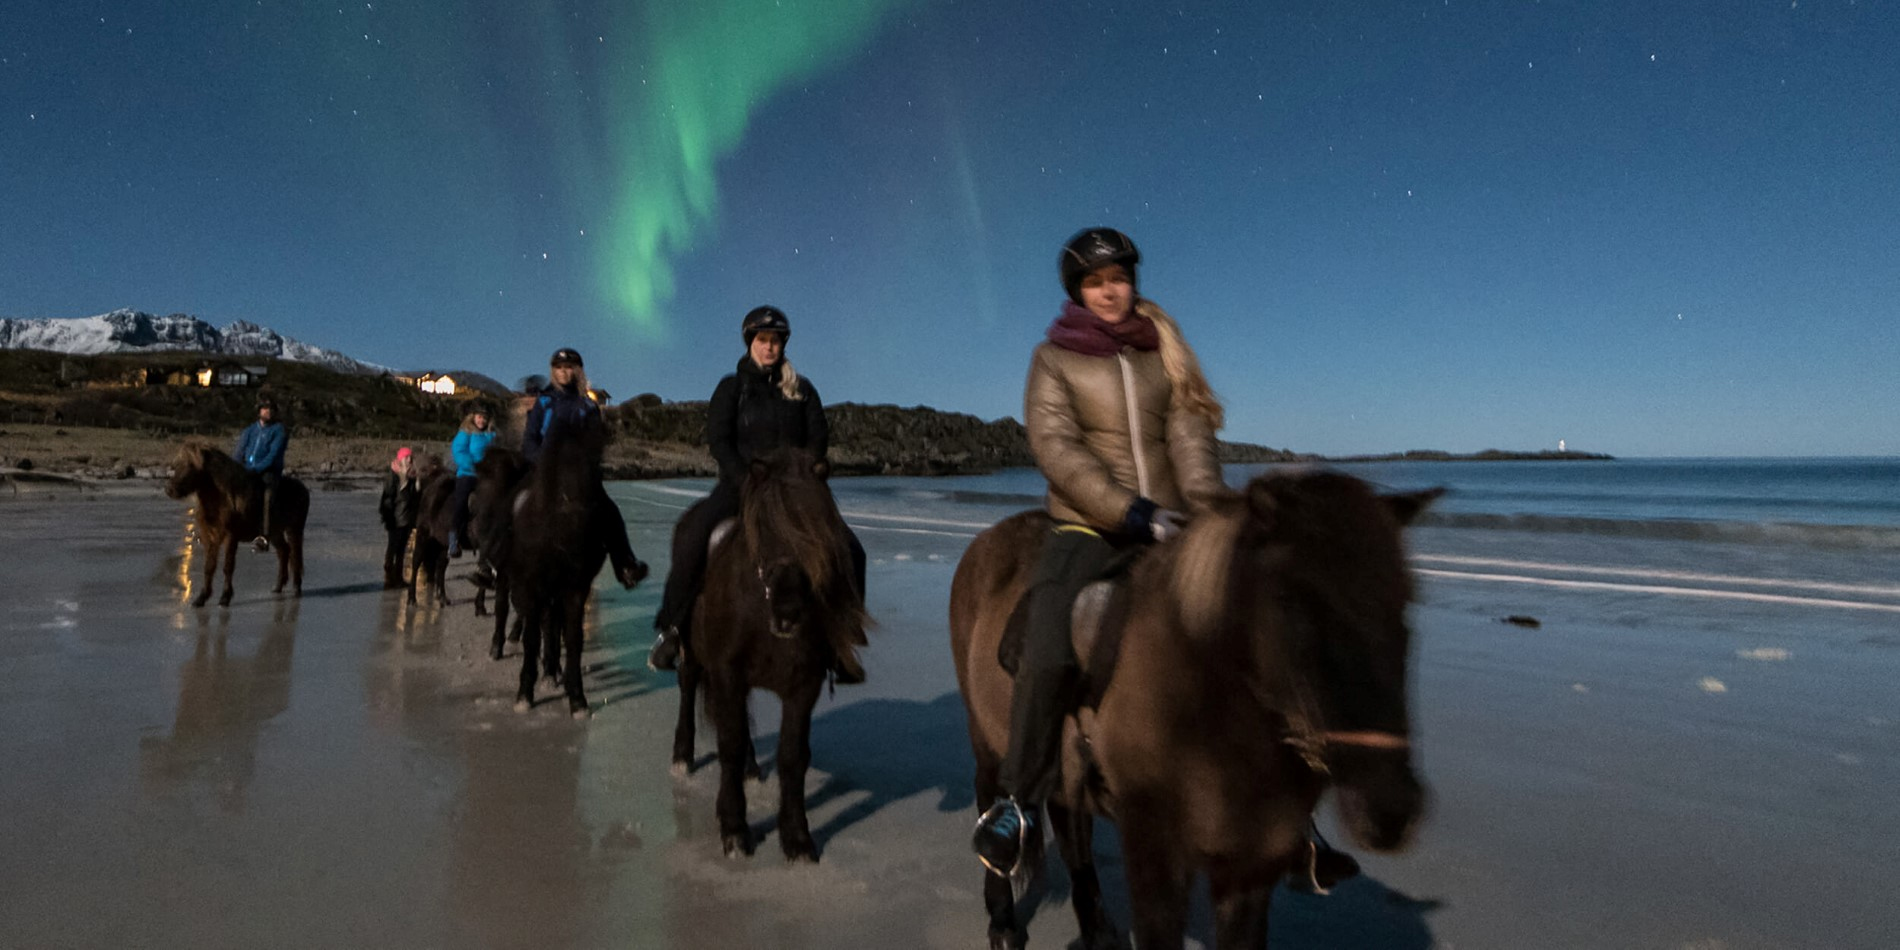 Hurtigruten excursion to explore Lofoten by horse